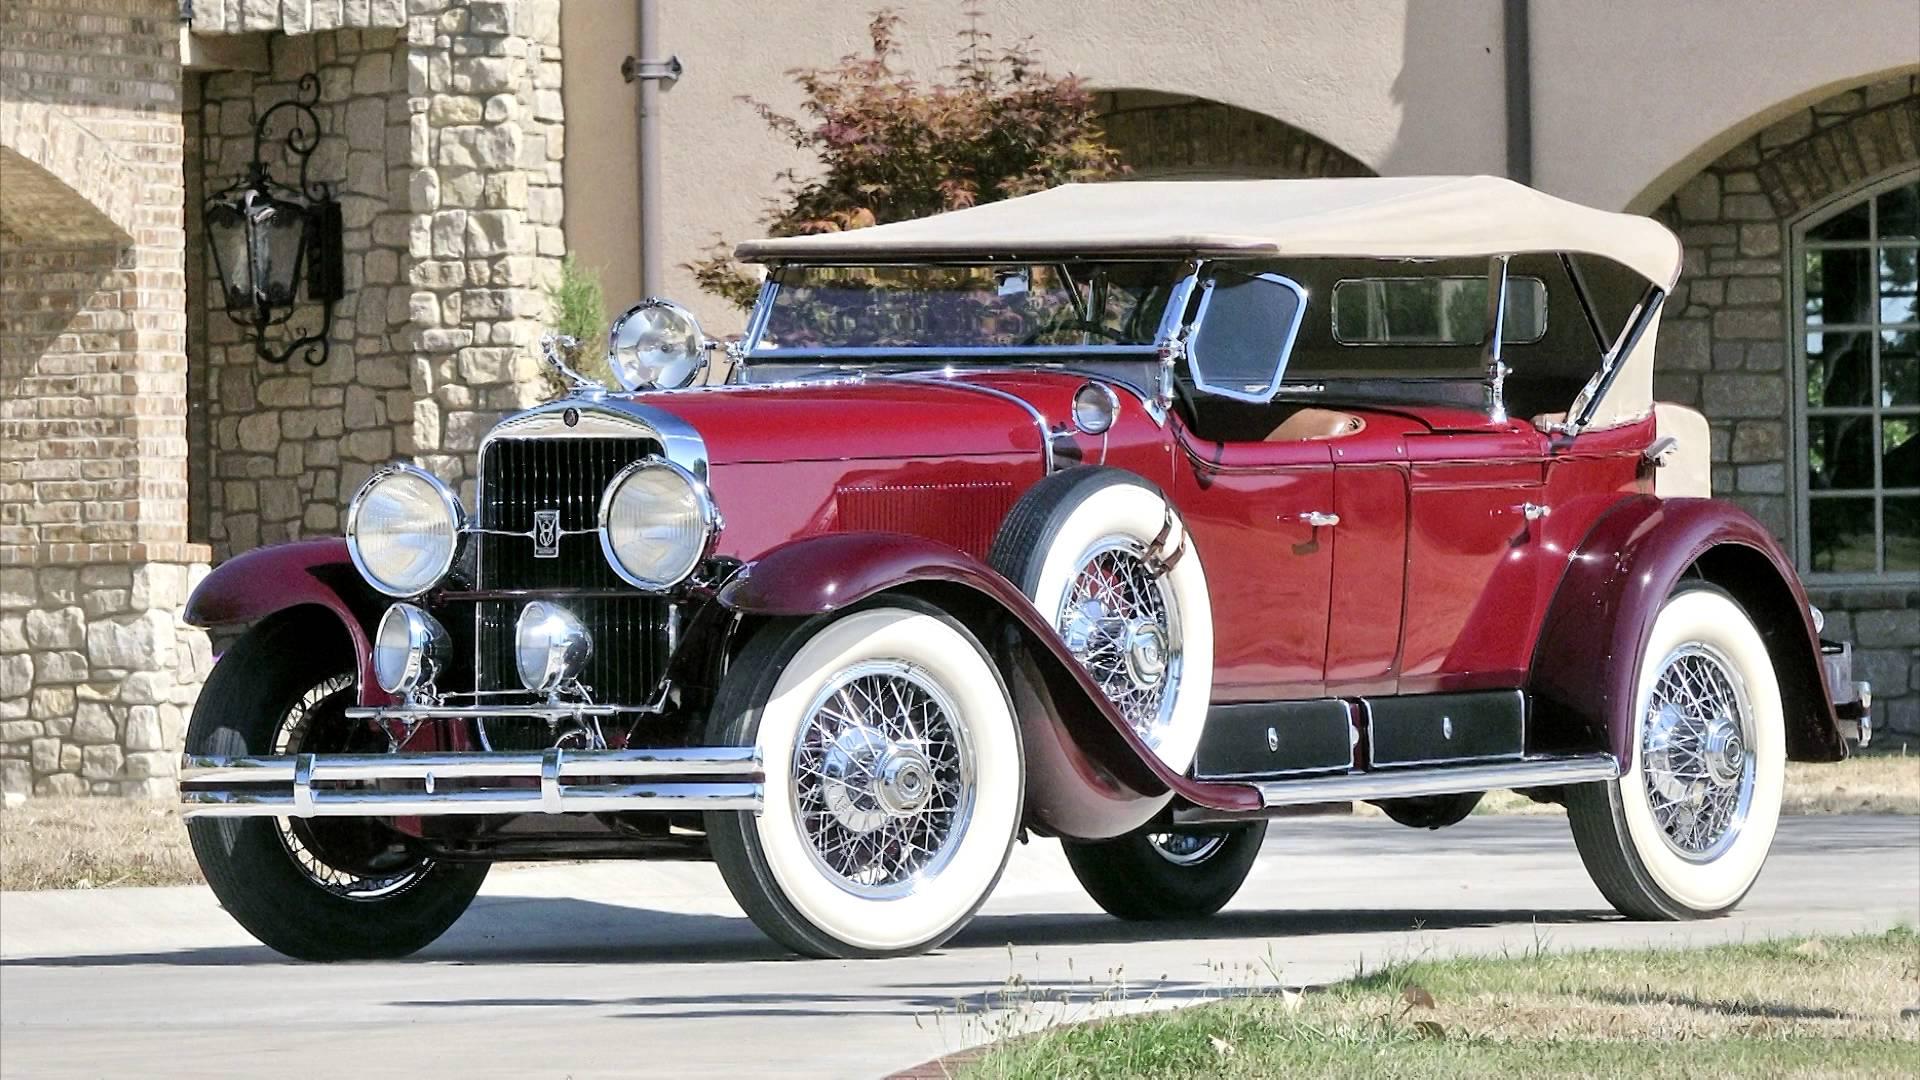 1929 Cadillac V-8 Dual Cowl Phaeton Pics, Vehicles Collection